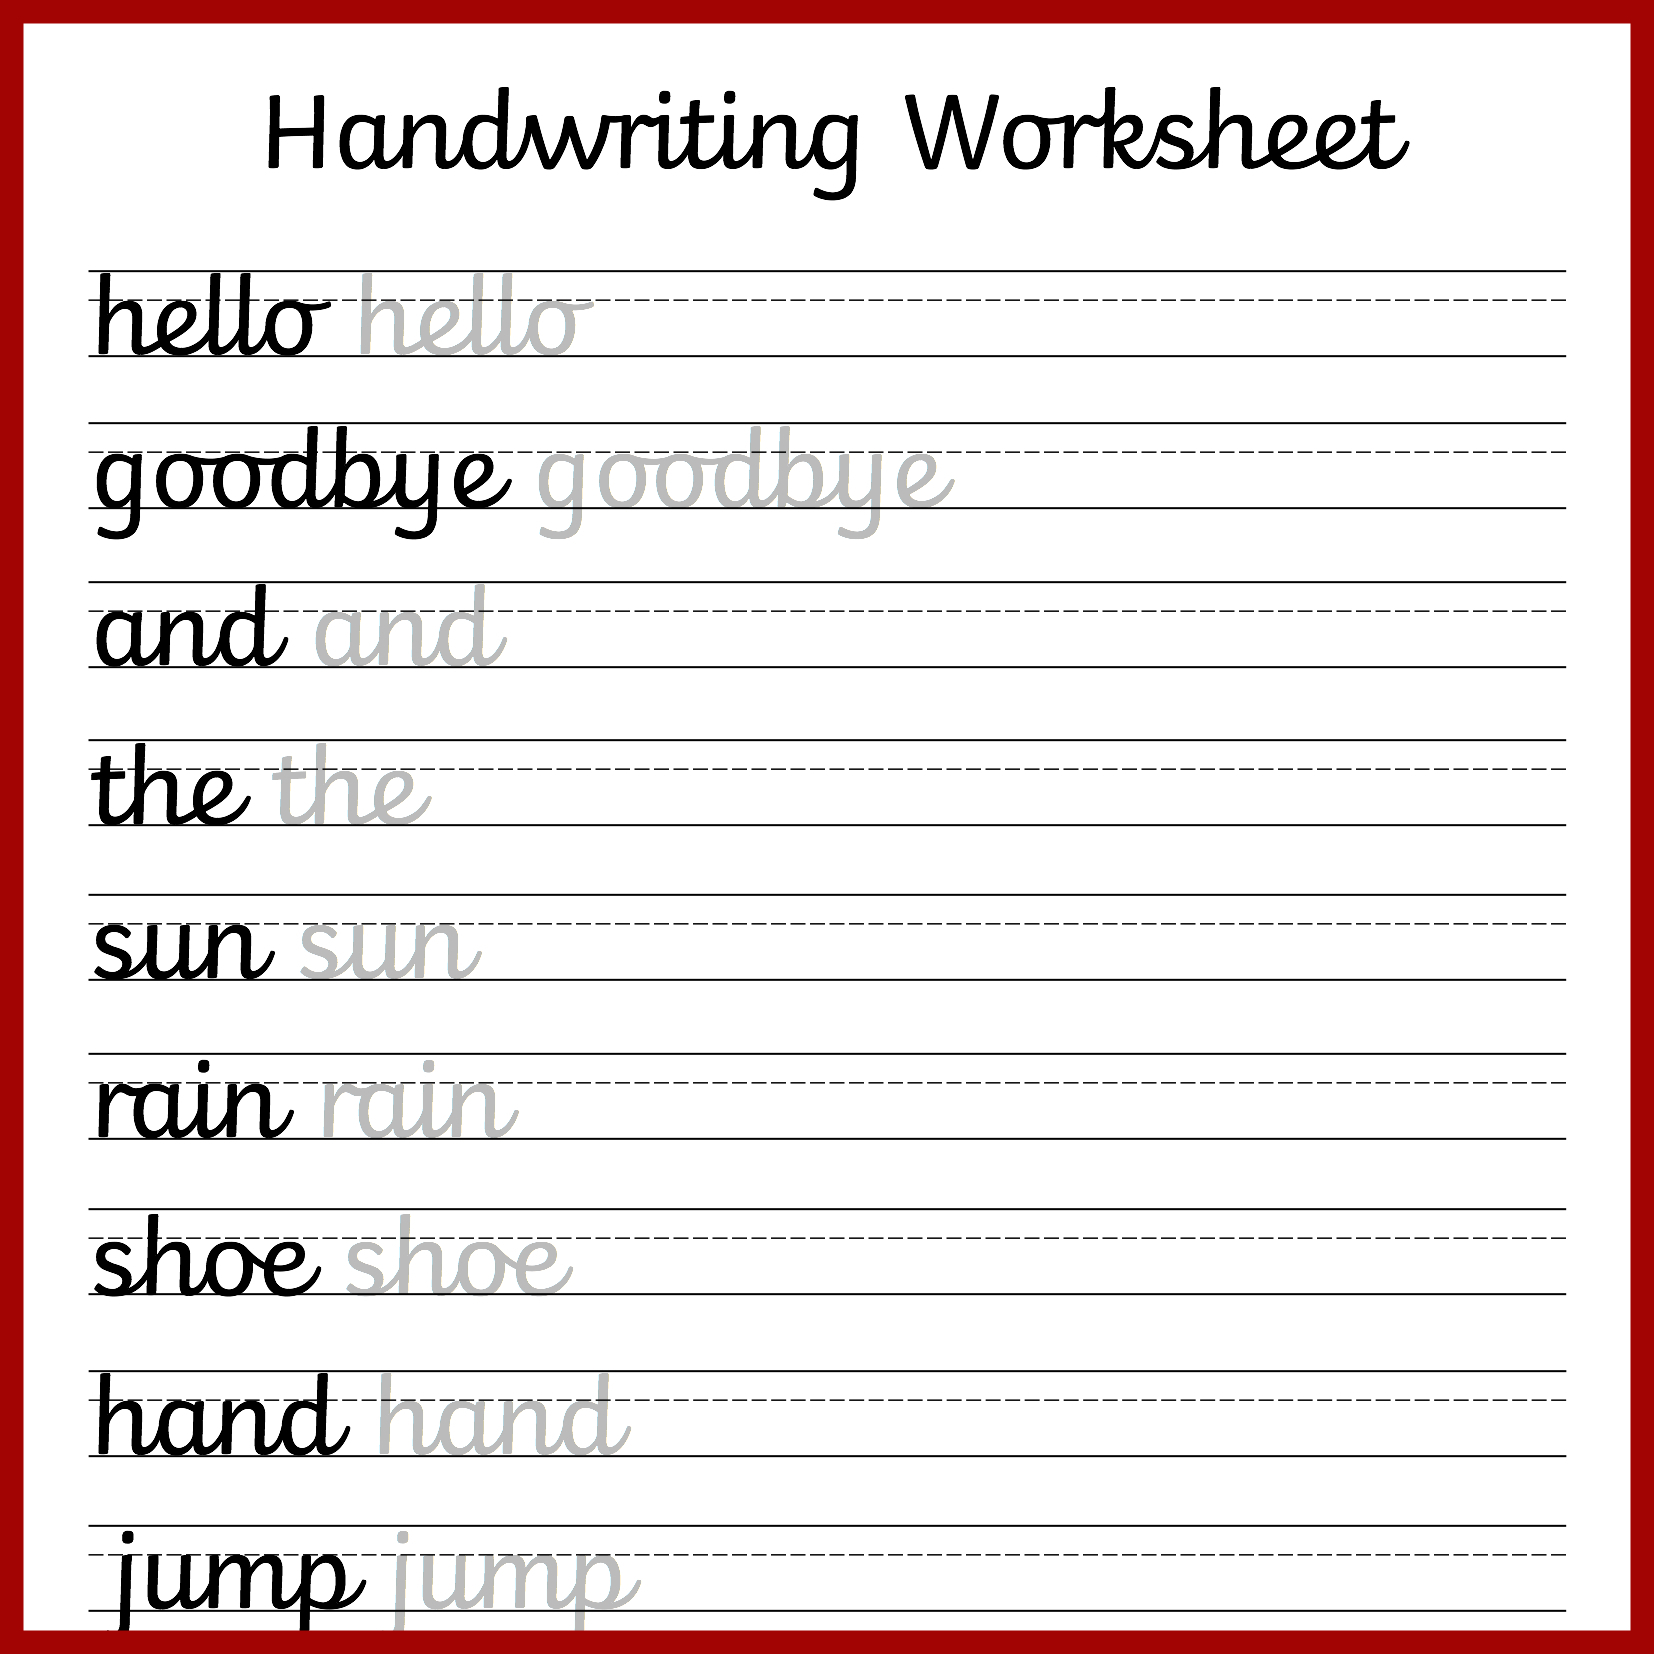 Cursive Handwriting Worksheets – Free Printable! ⋆ Mama Geek - Free | Free Printable Handwriting Worksheets